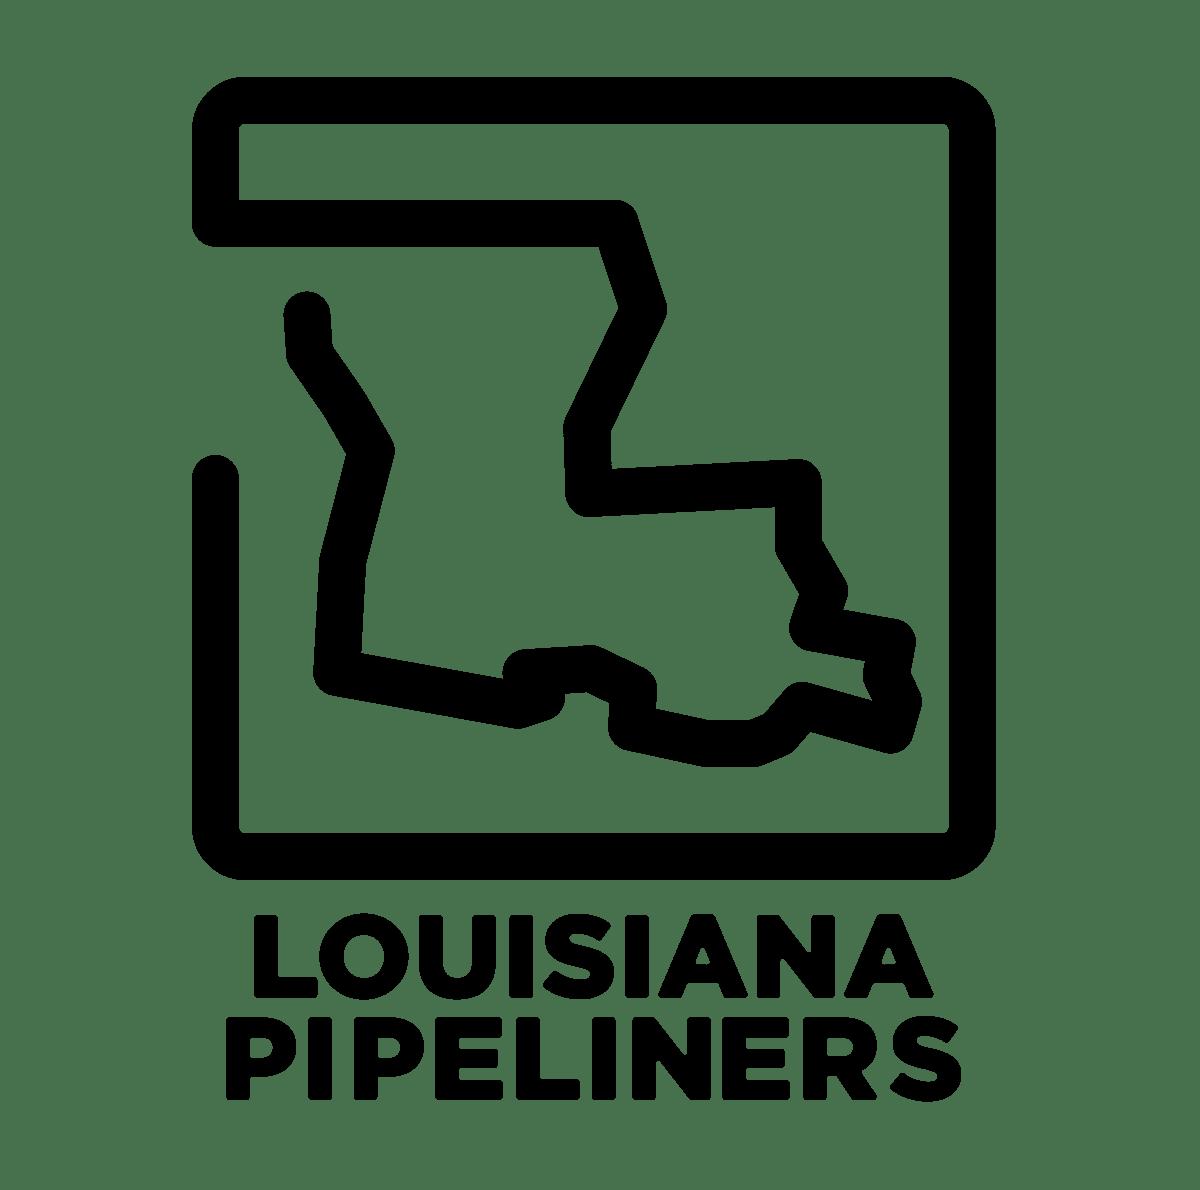 Louisiana Pipeliners On Behance